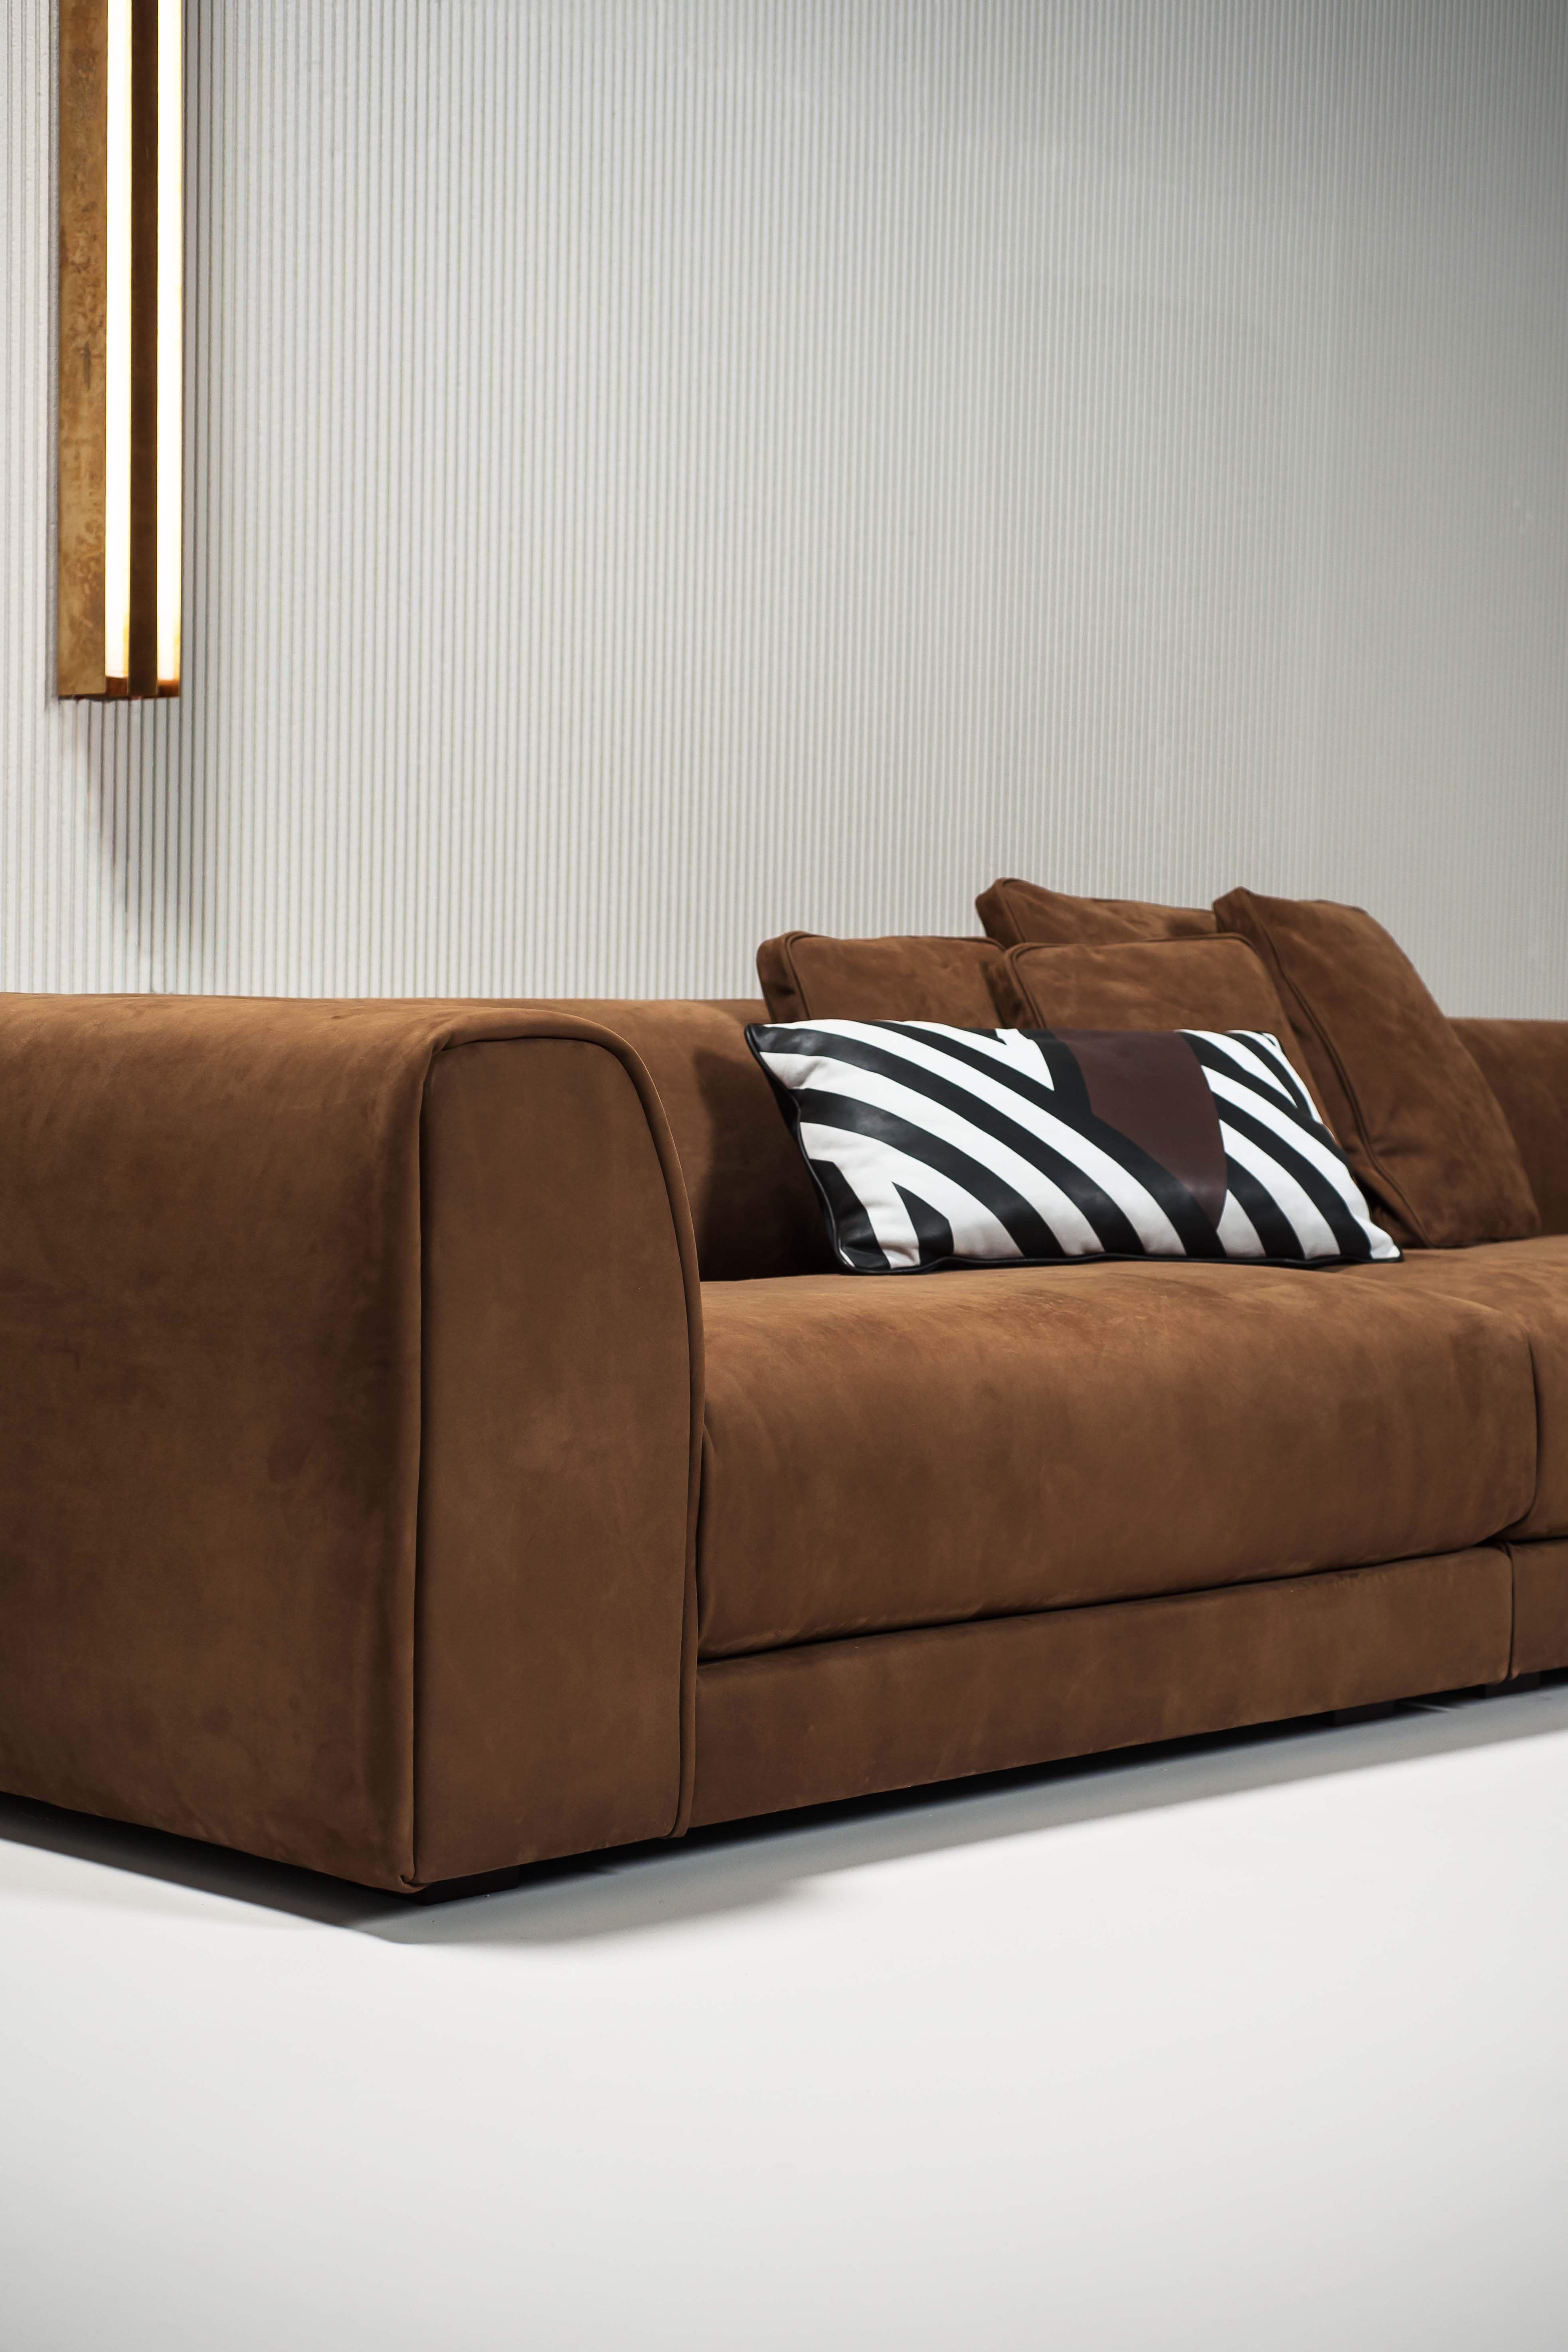 Sofa Rafael Design Roberto Lazzeroni Kashmir Cognac Leather